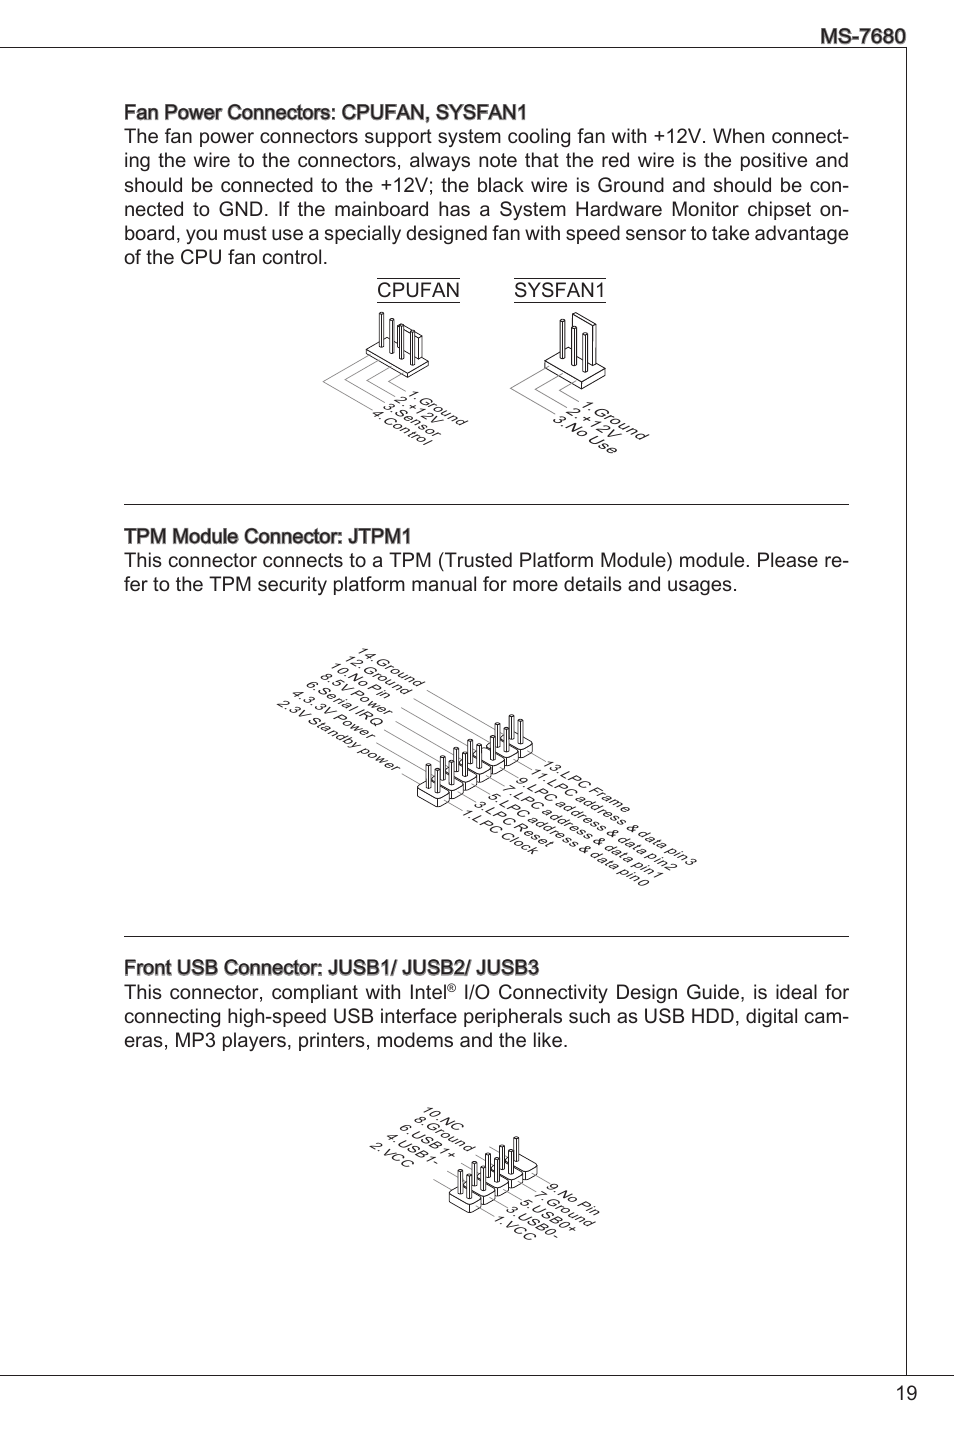 medium resolution of p25 wiring diagram book diagram schema p25 wiring diagram p25 wiring diagram